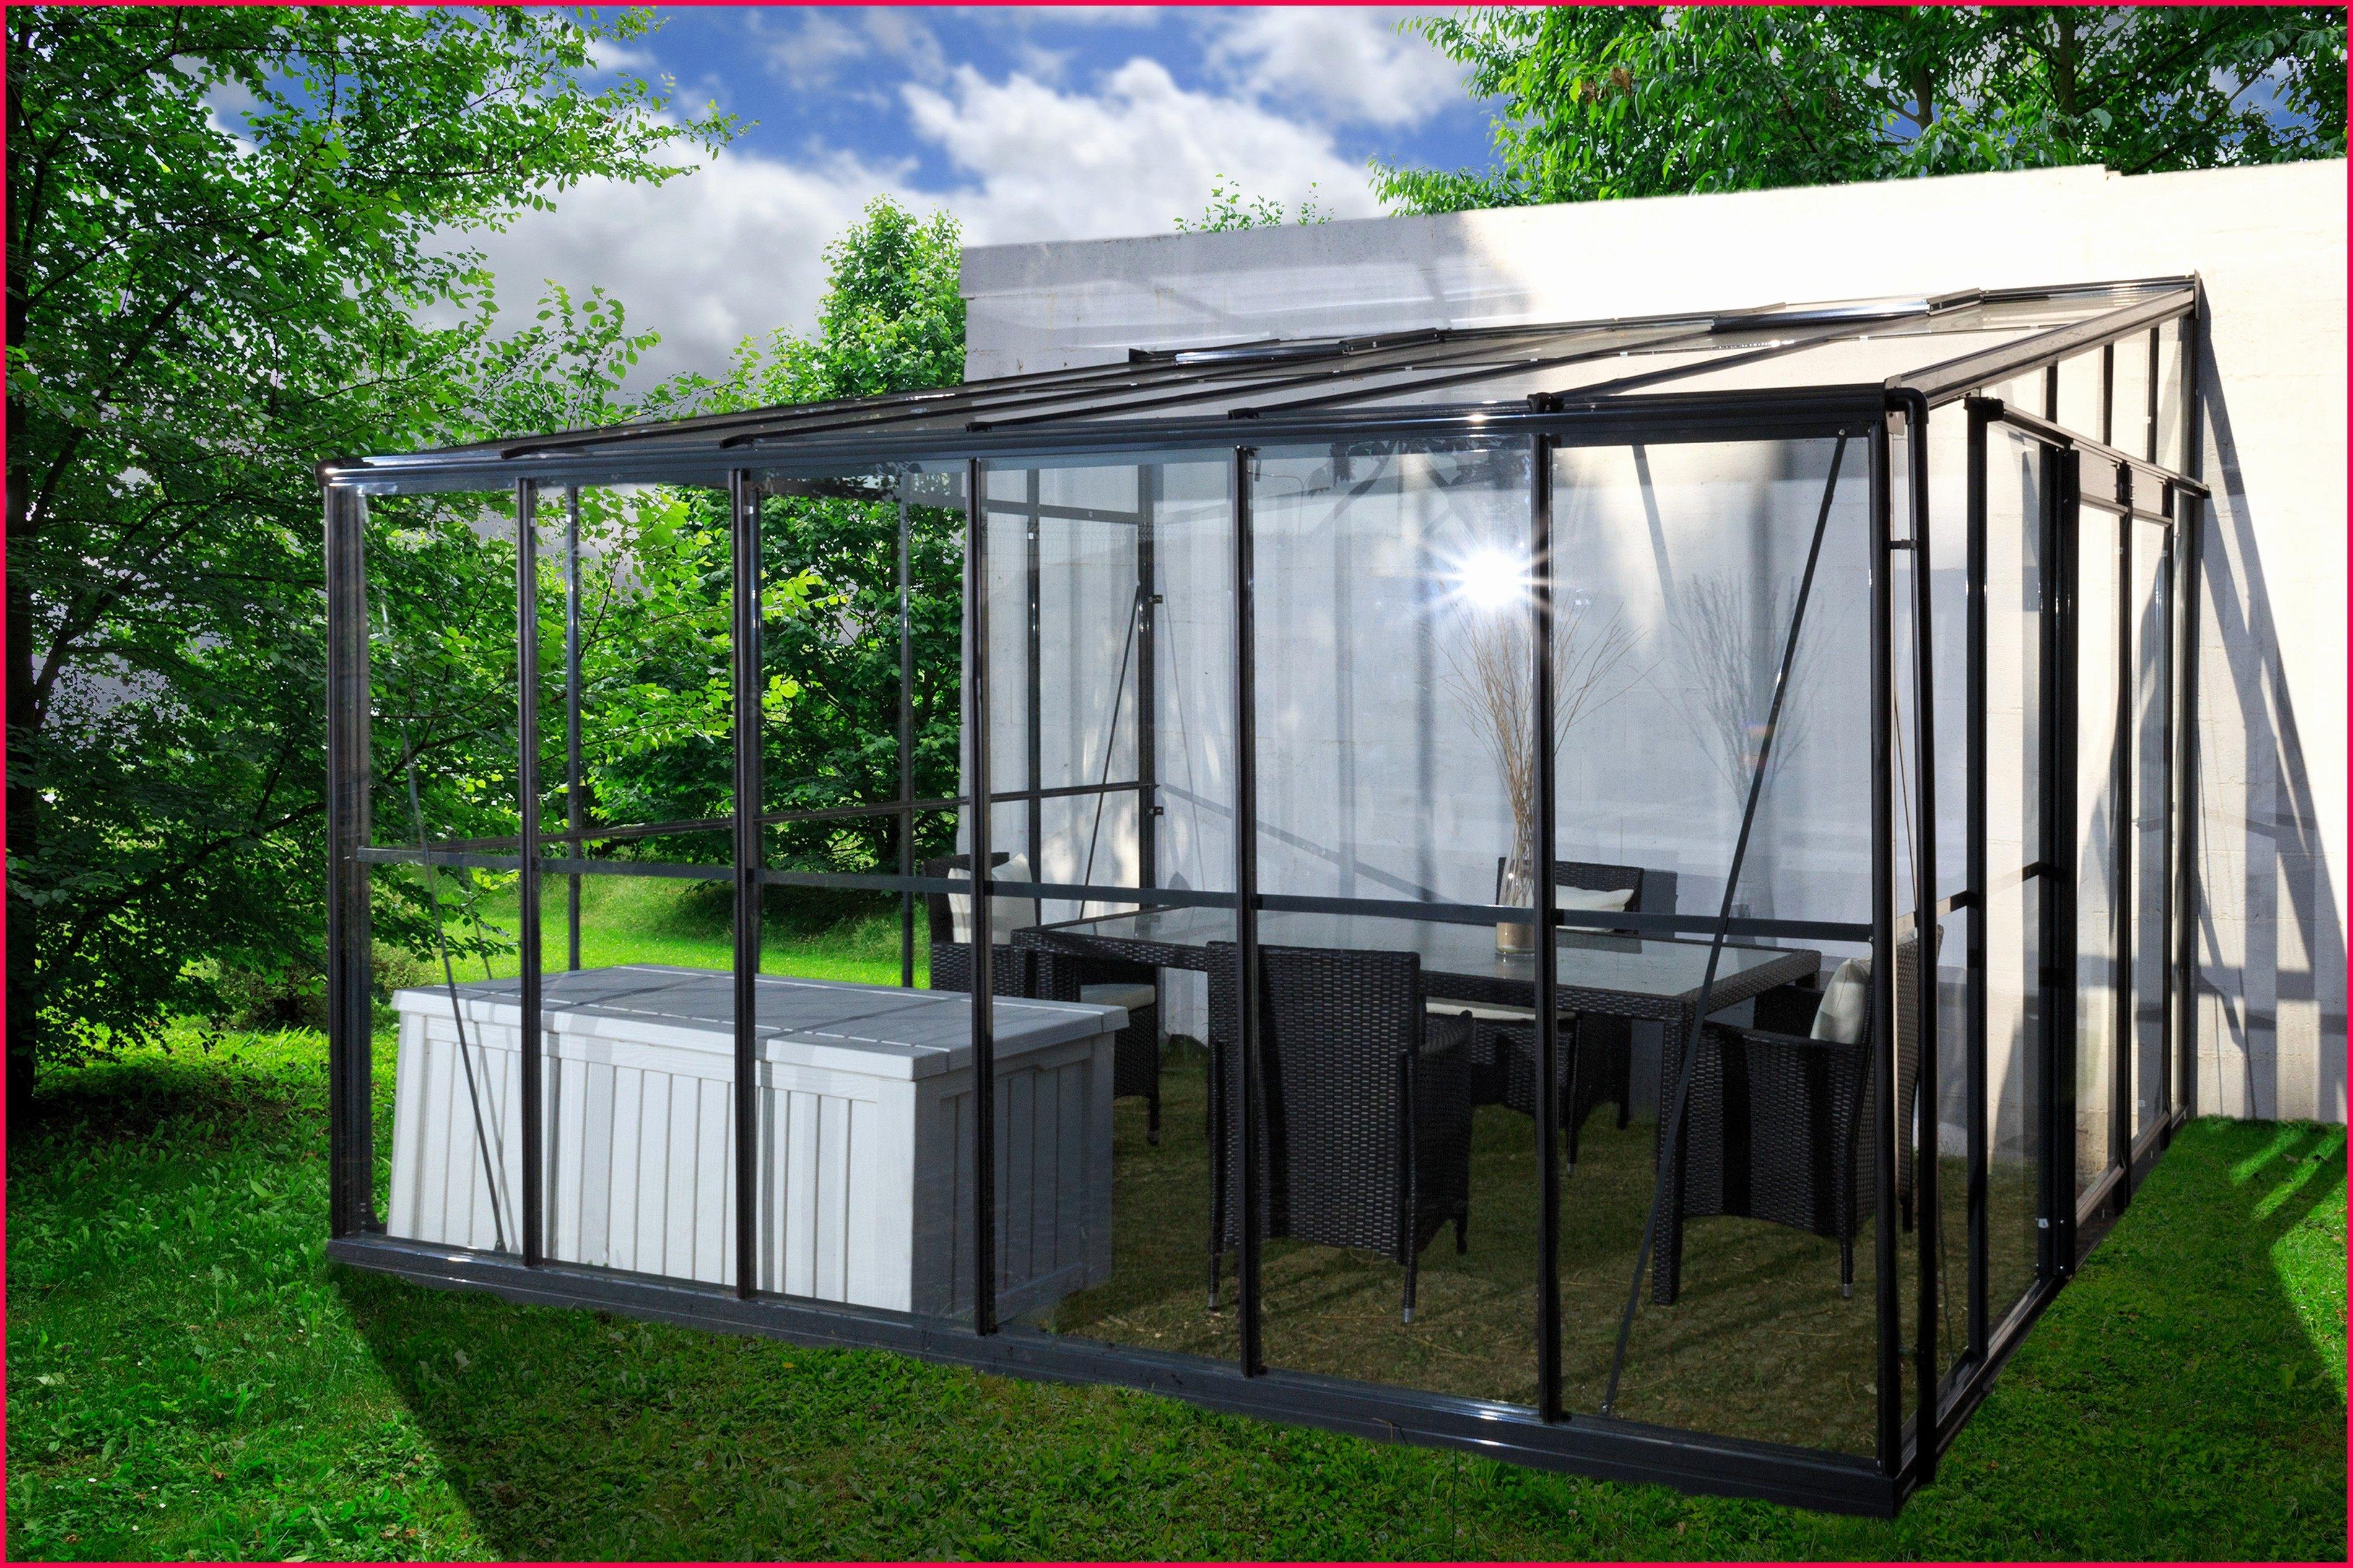 Abri De Terrasse Leroy Merlin Élégant Stock Cabane Jardin Leroy Merlin Aussi Cool Moderne Abri Serre Free Serre